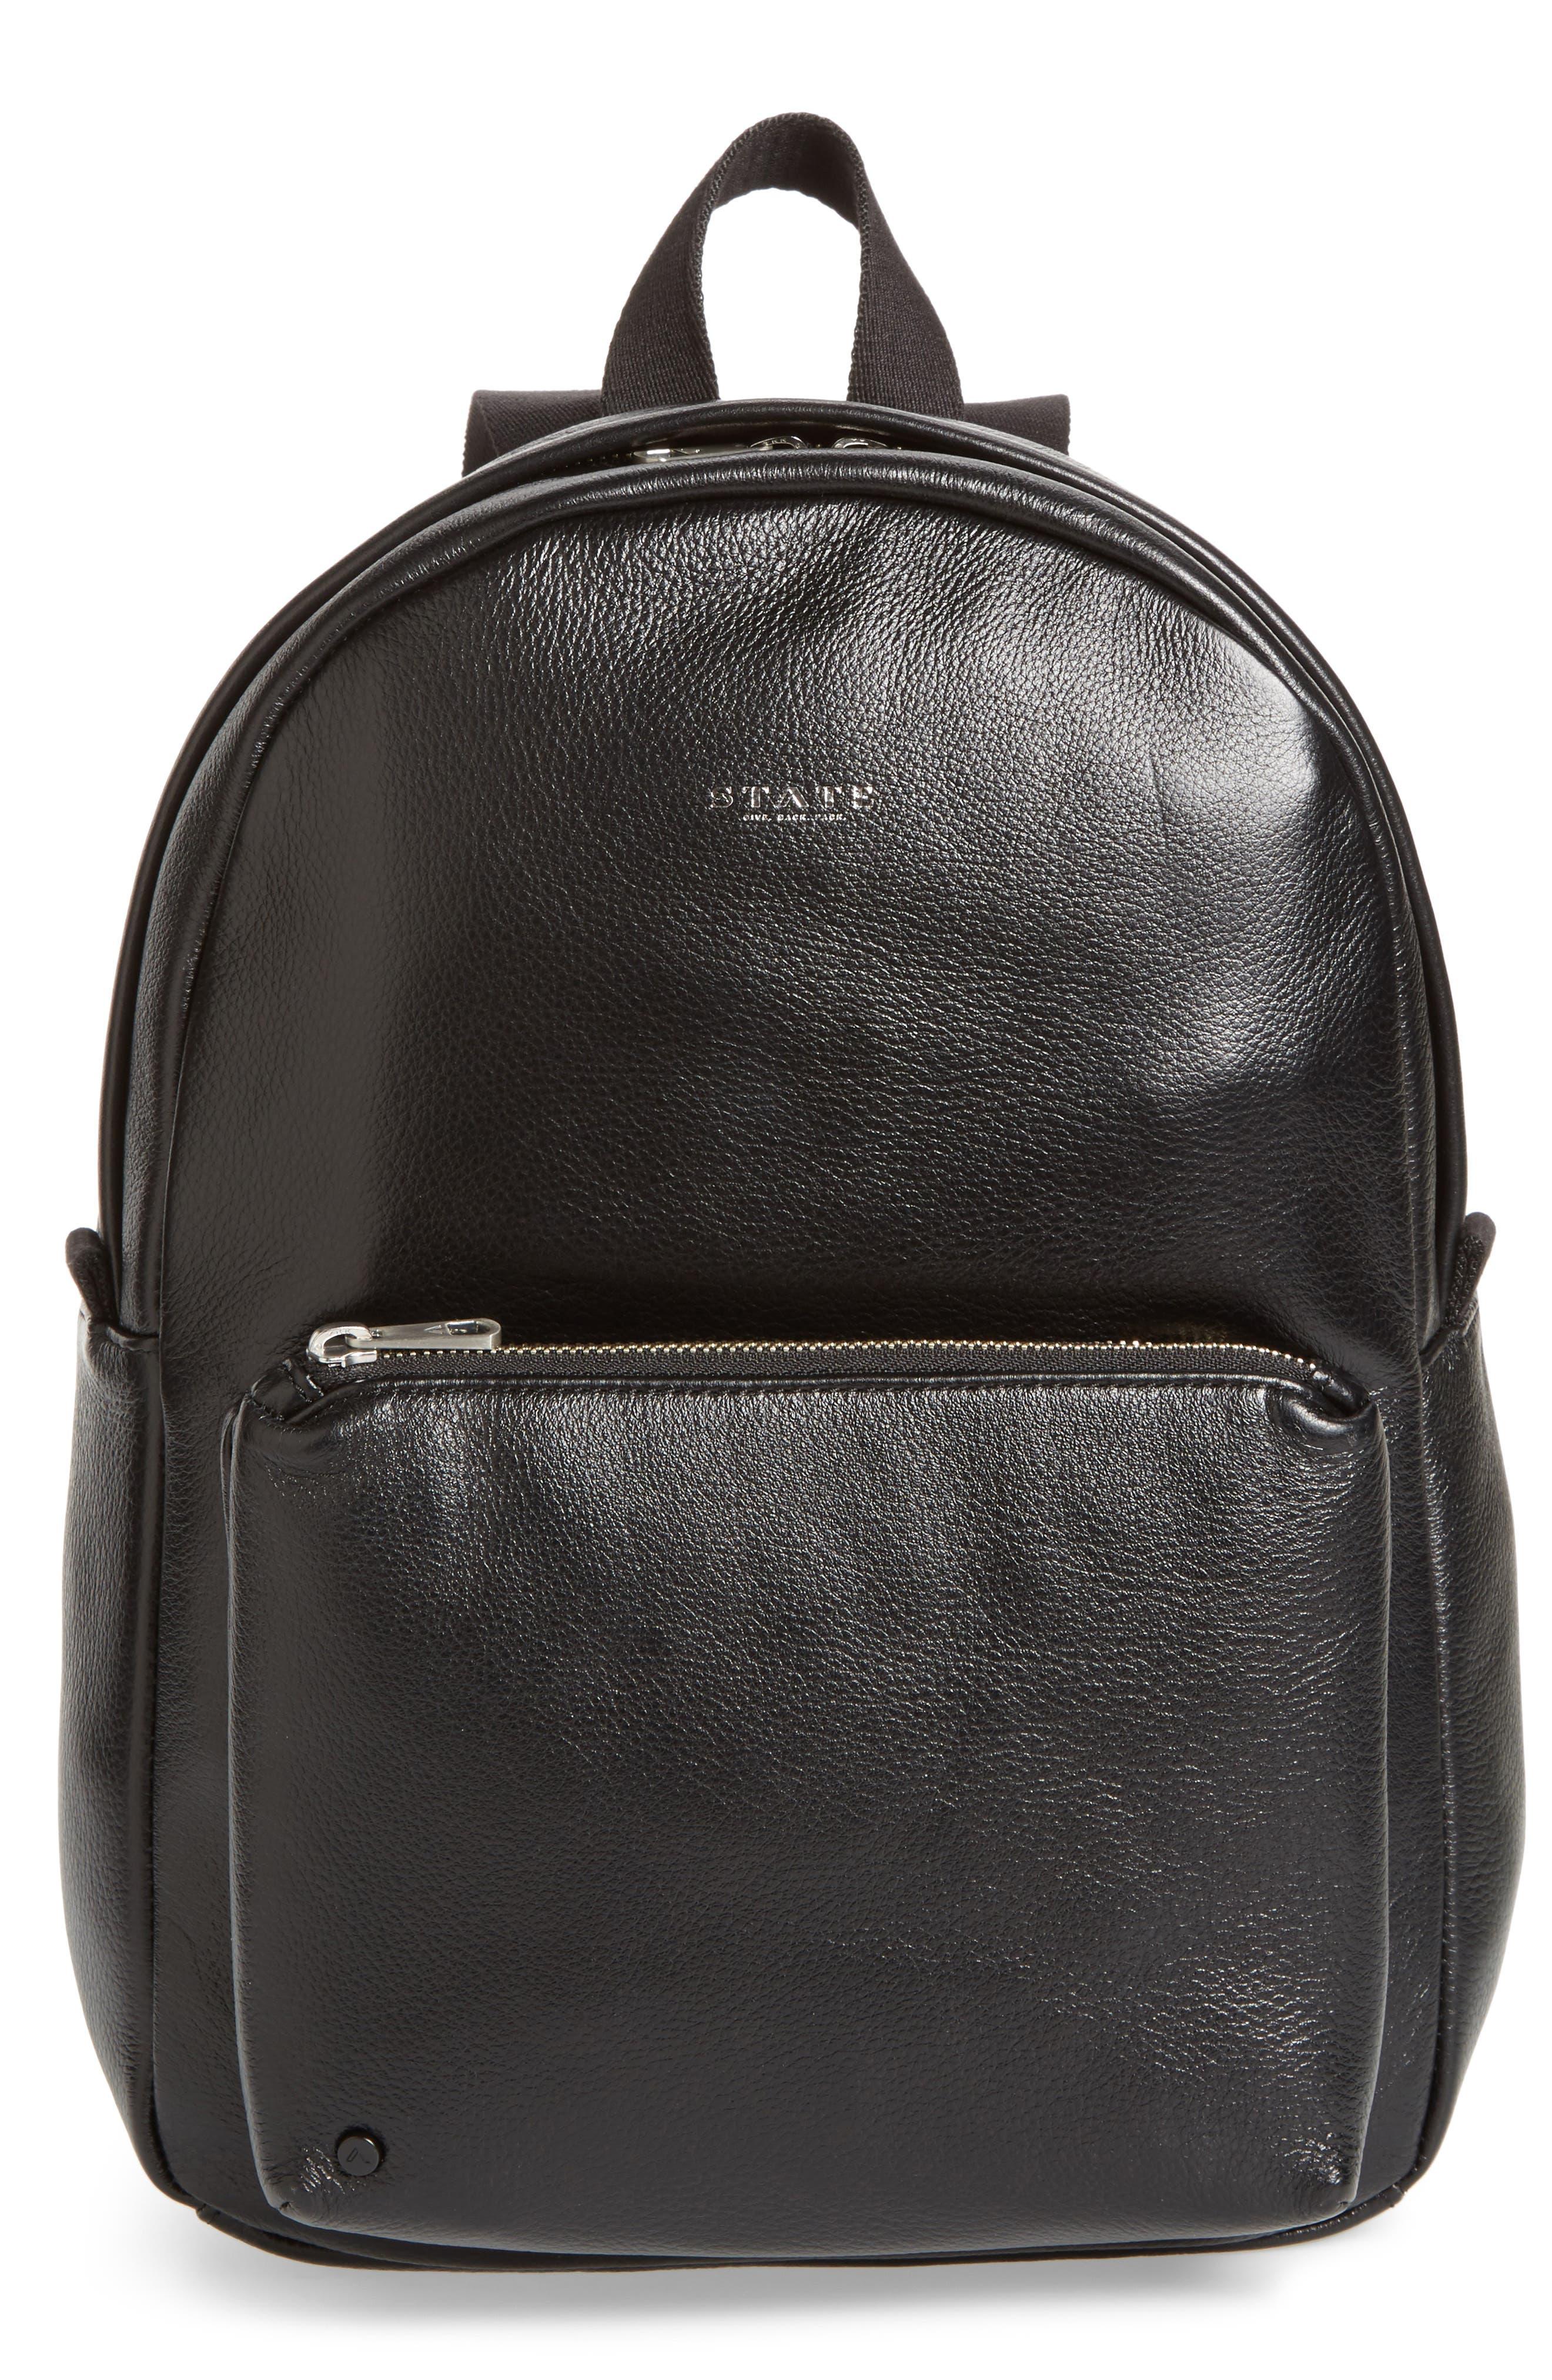 Main Image - STATE Bags Greenwood Mini Lorimer Leather Backpack